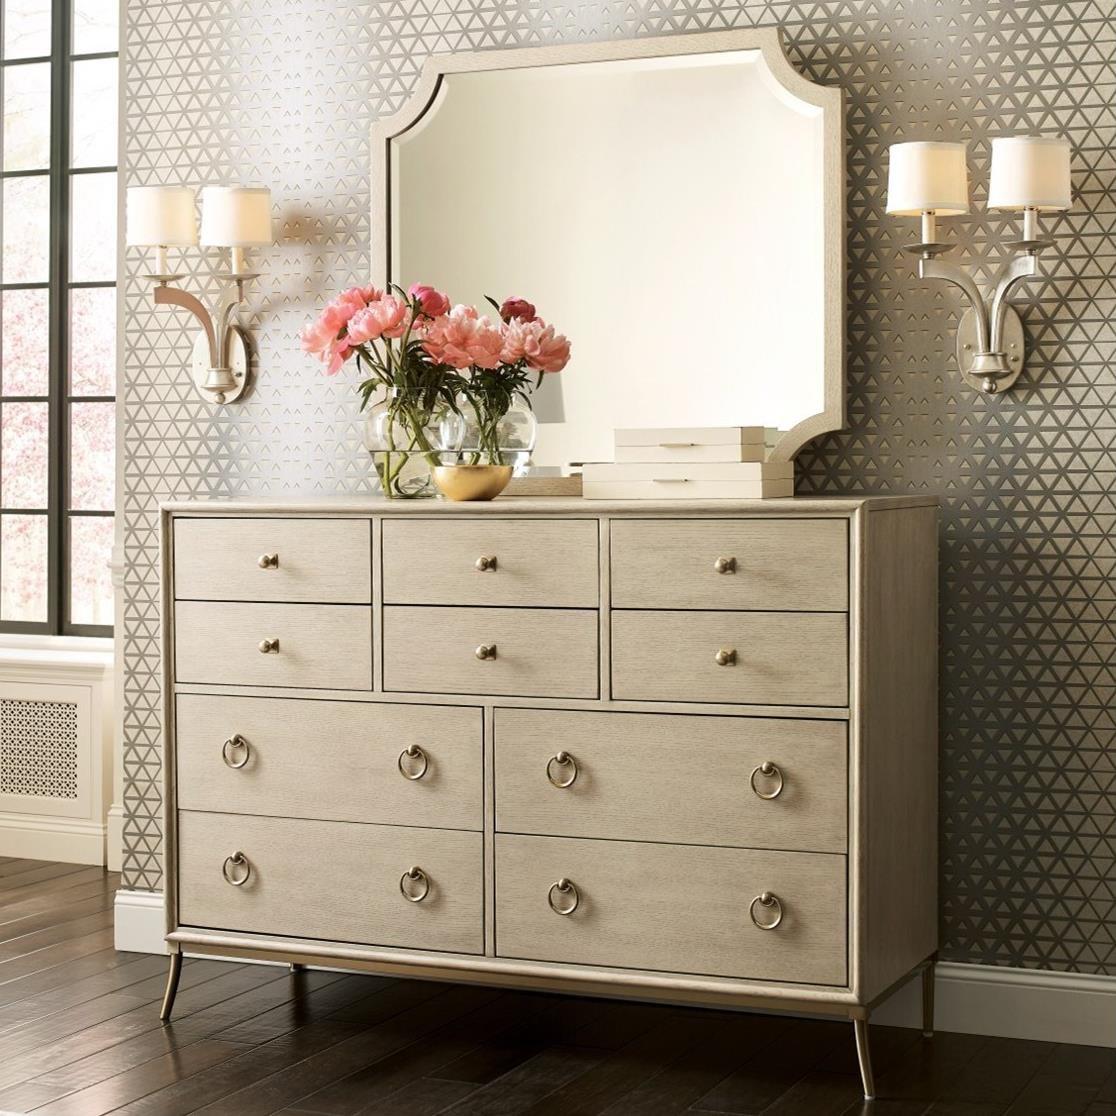 American Drew Lenox Ventura 10 Drawer Dresser And Mirror Set Lindy S Furniture Company Dresser Mirror Sets